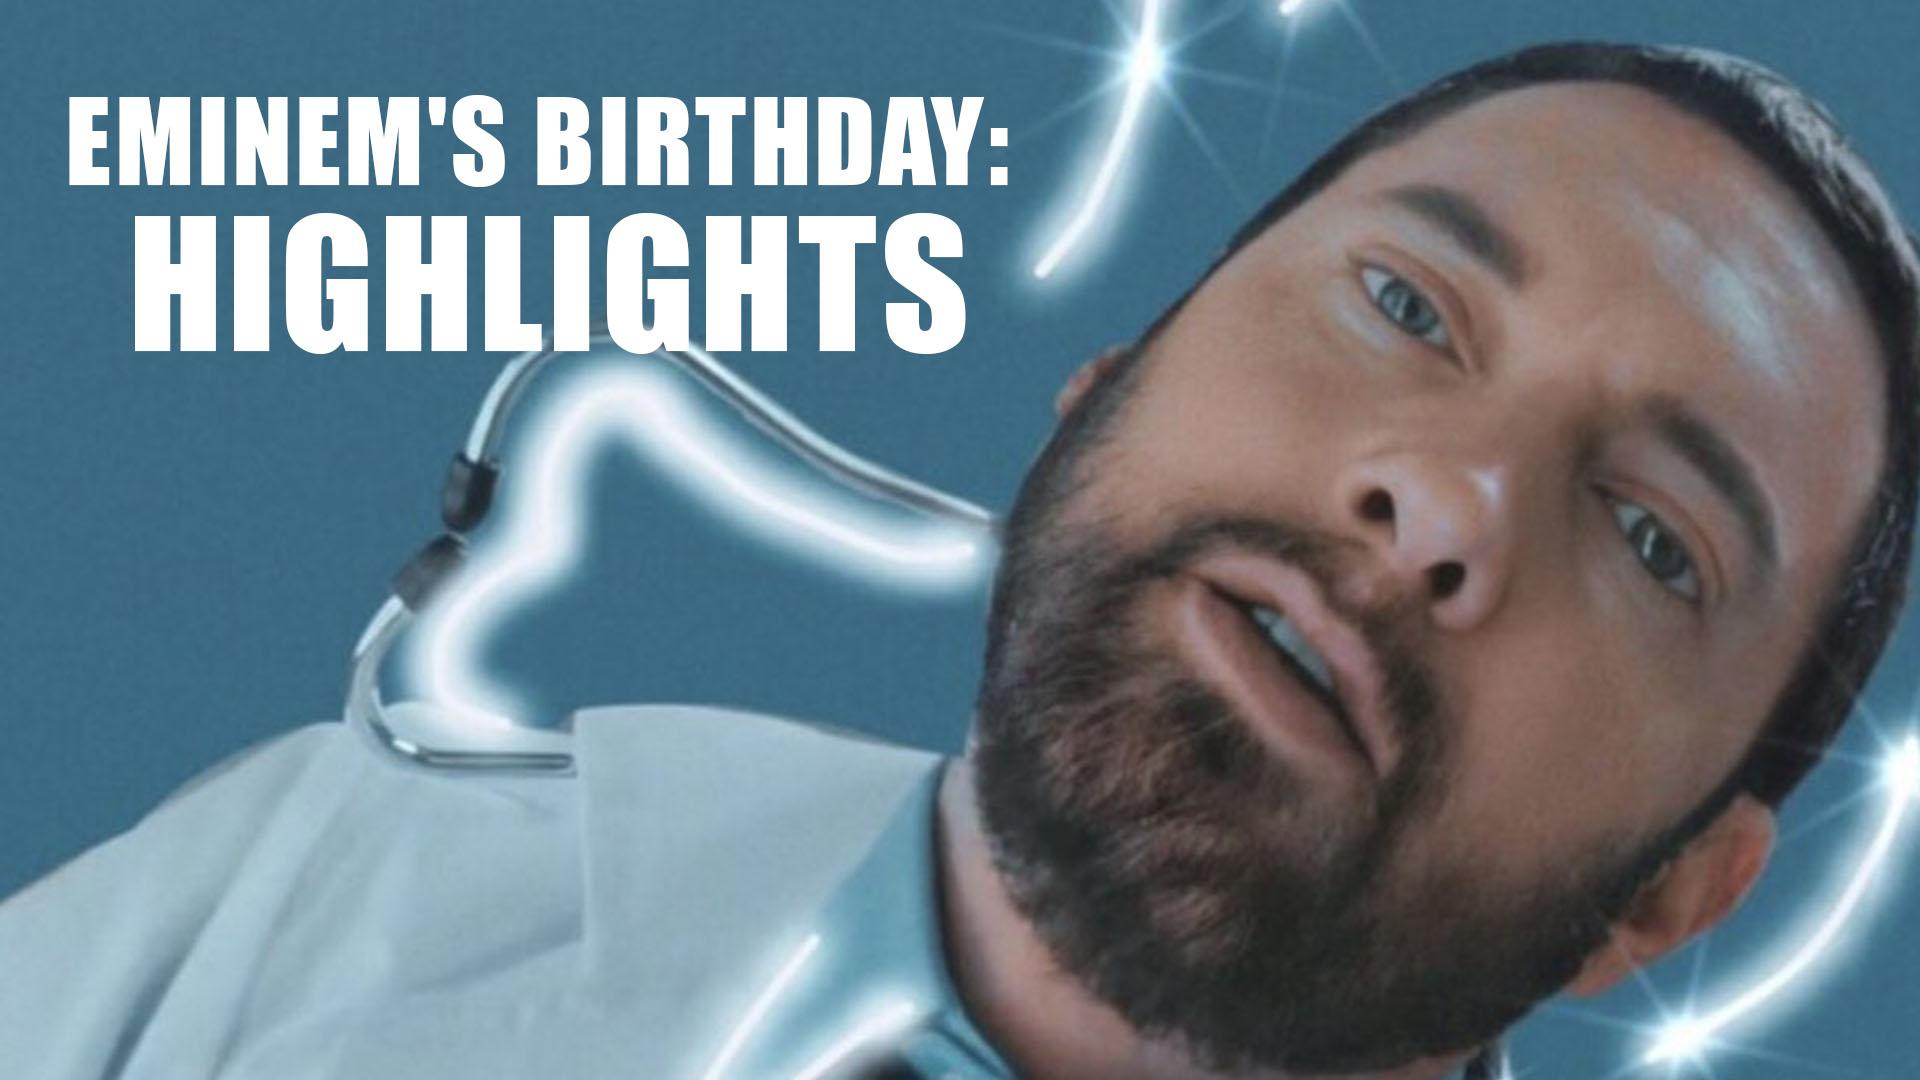 Fans Celebrate Eminem's Birthday: Highlights